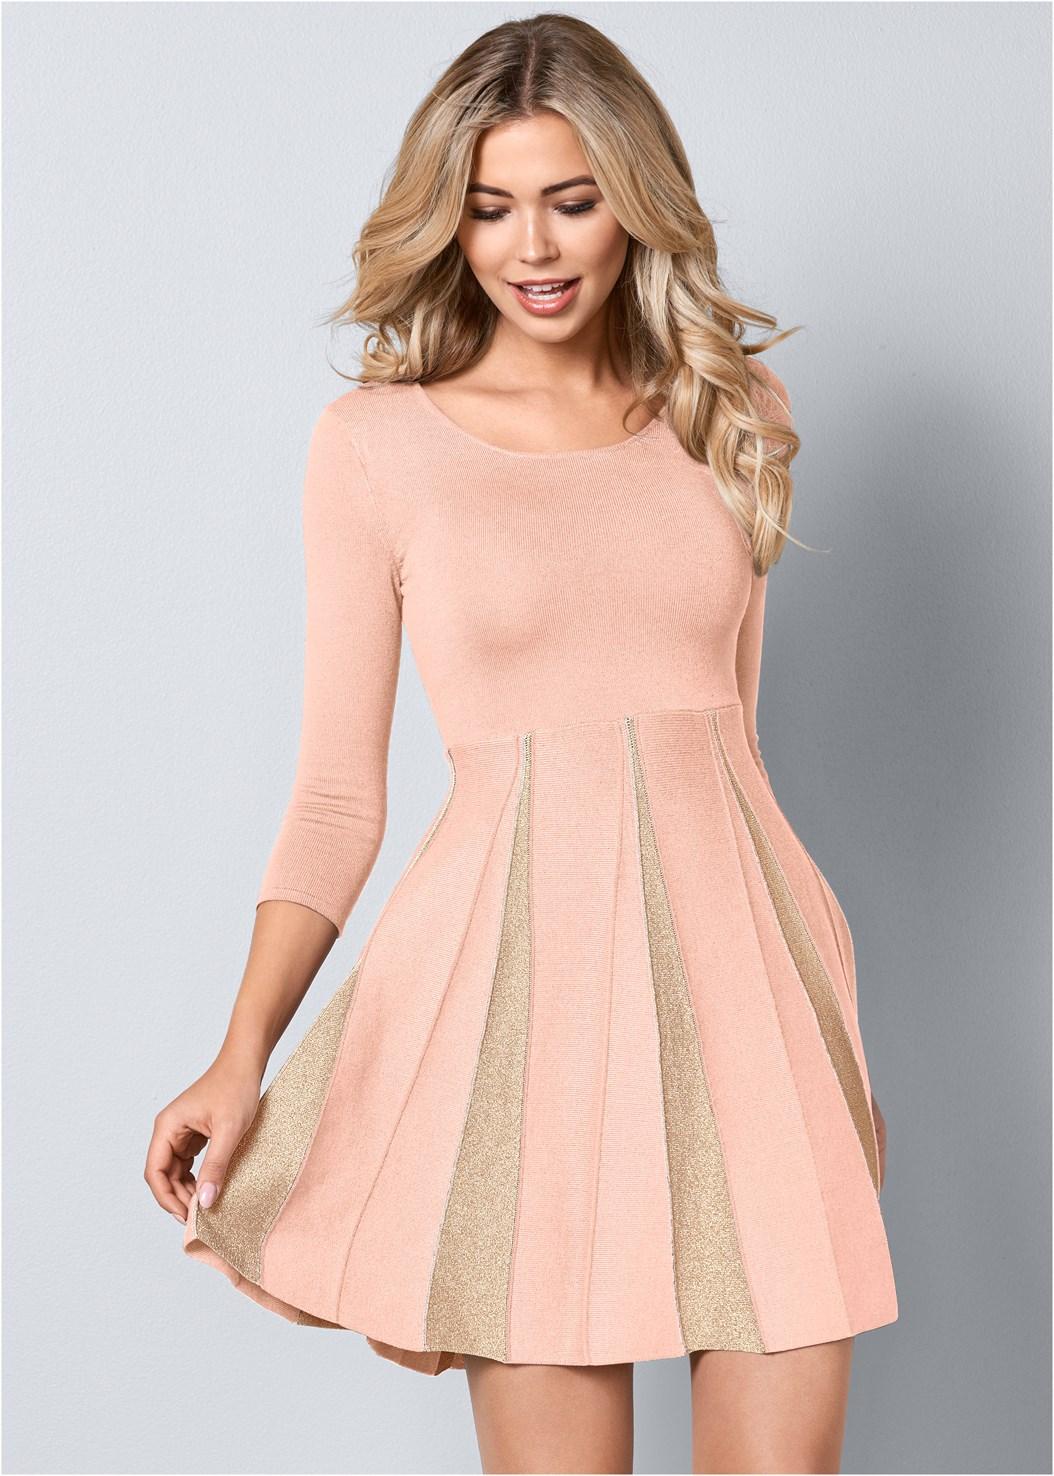 Glitter Sweater Dress,High Heel Strappy Sandals